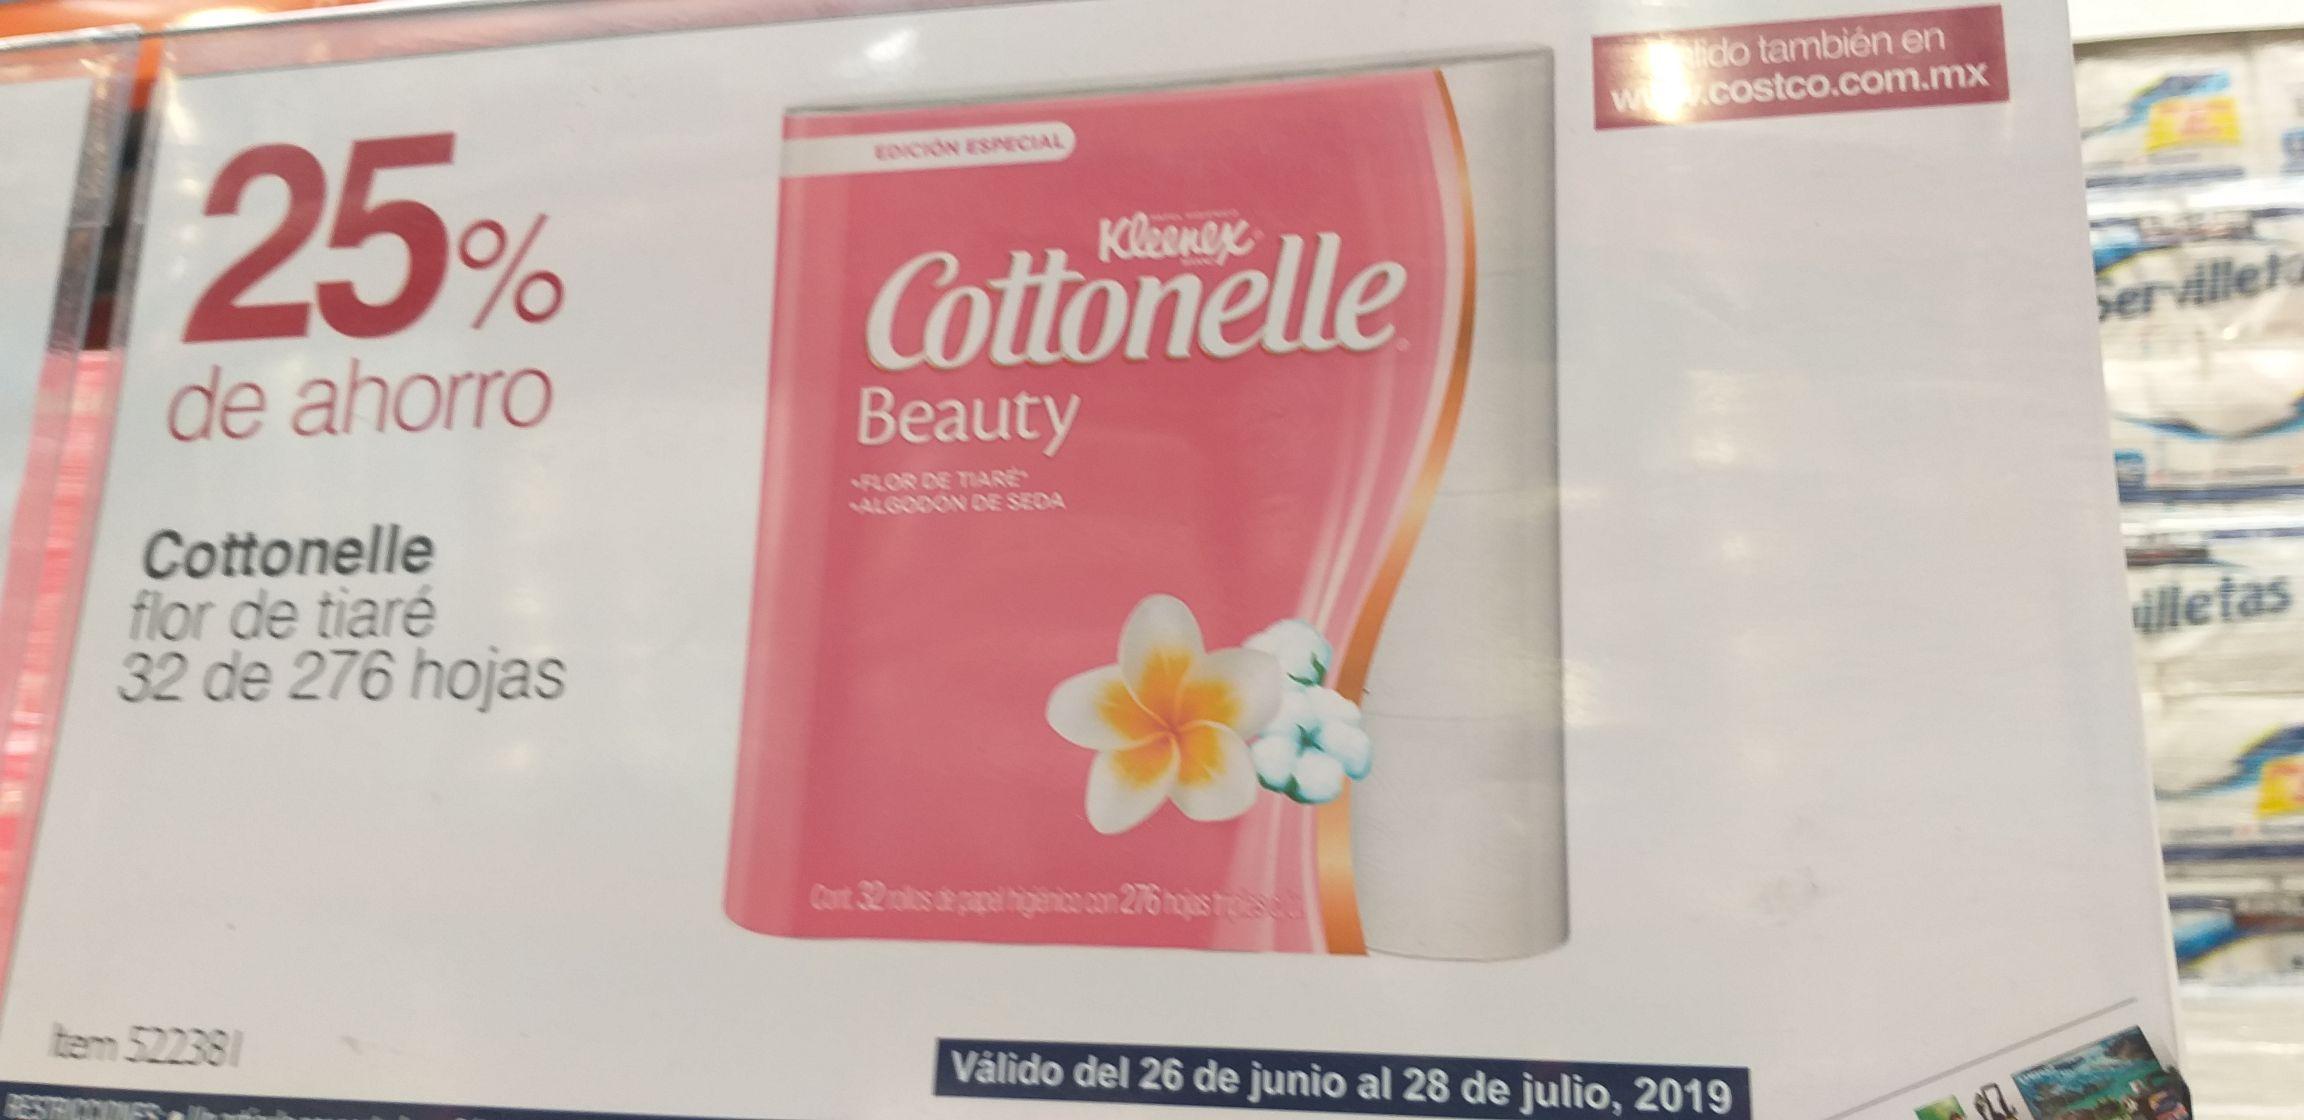 Costco: Cottonelle flor tiare papel higiénico